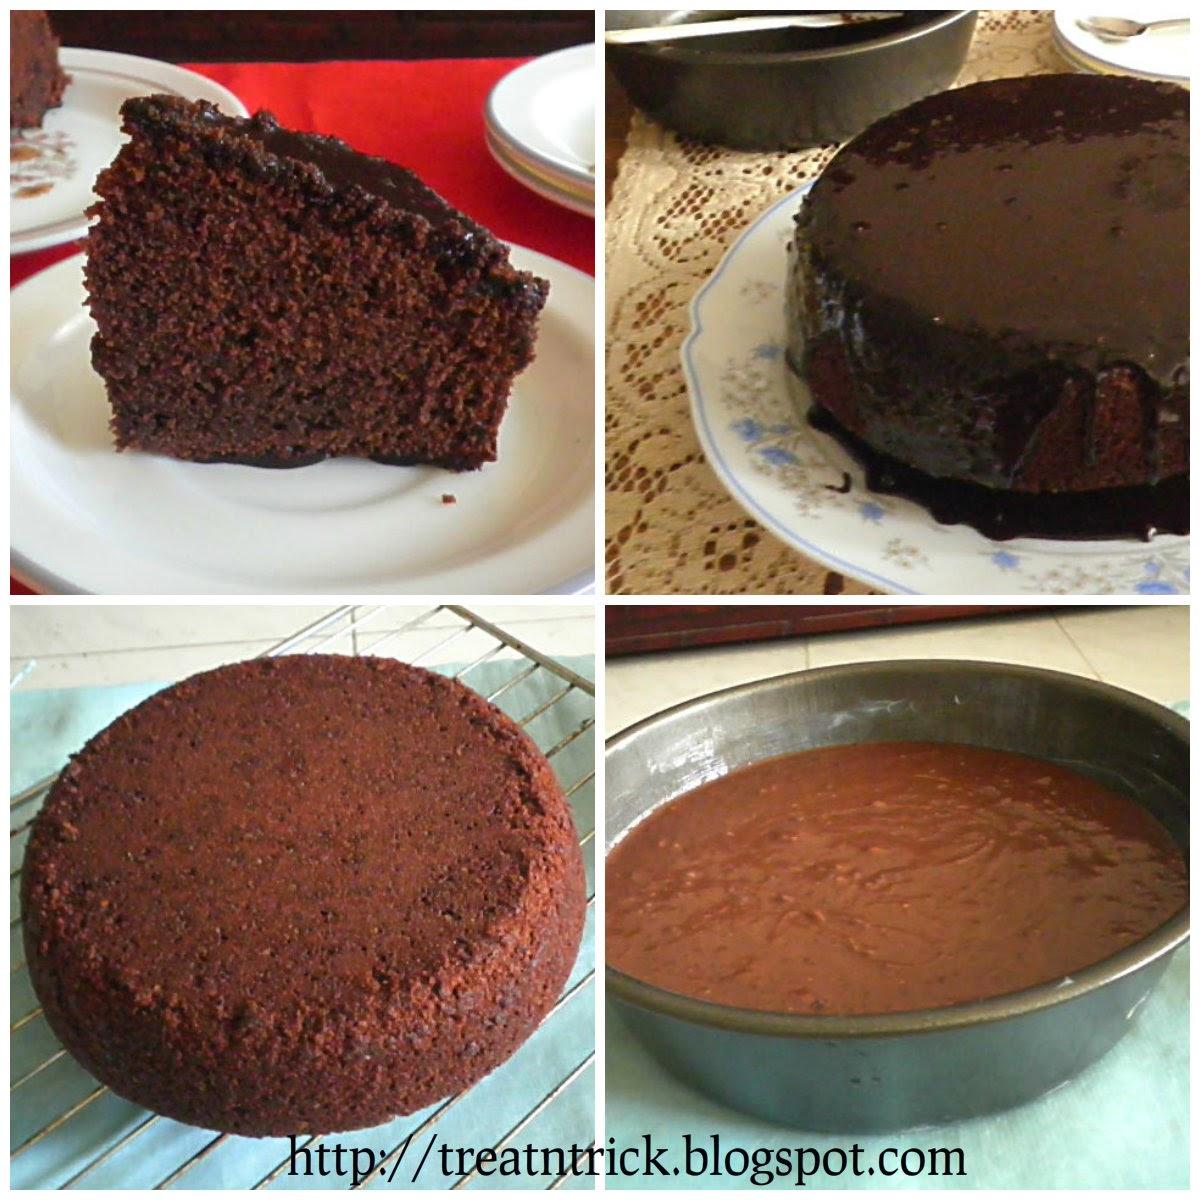 Chocolate Cake w/Chocolate Frosting